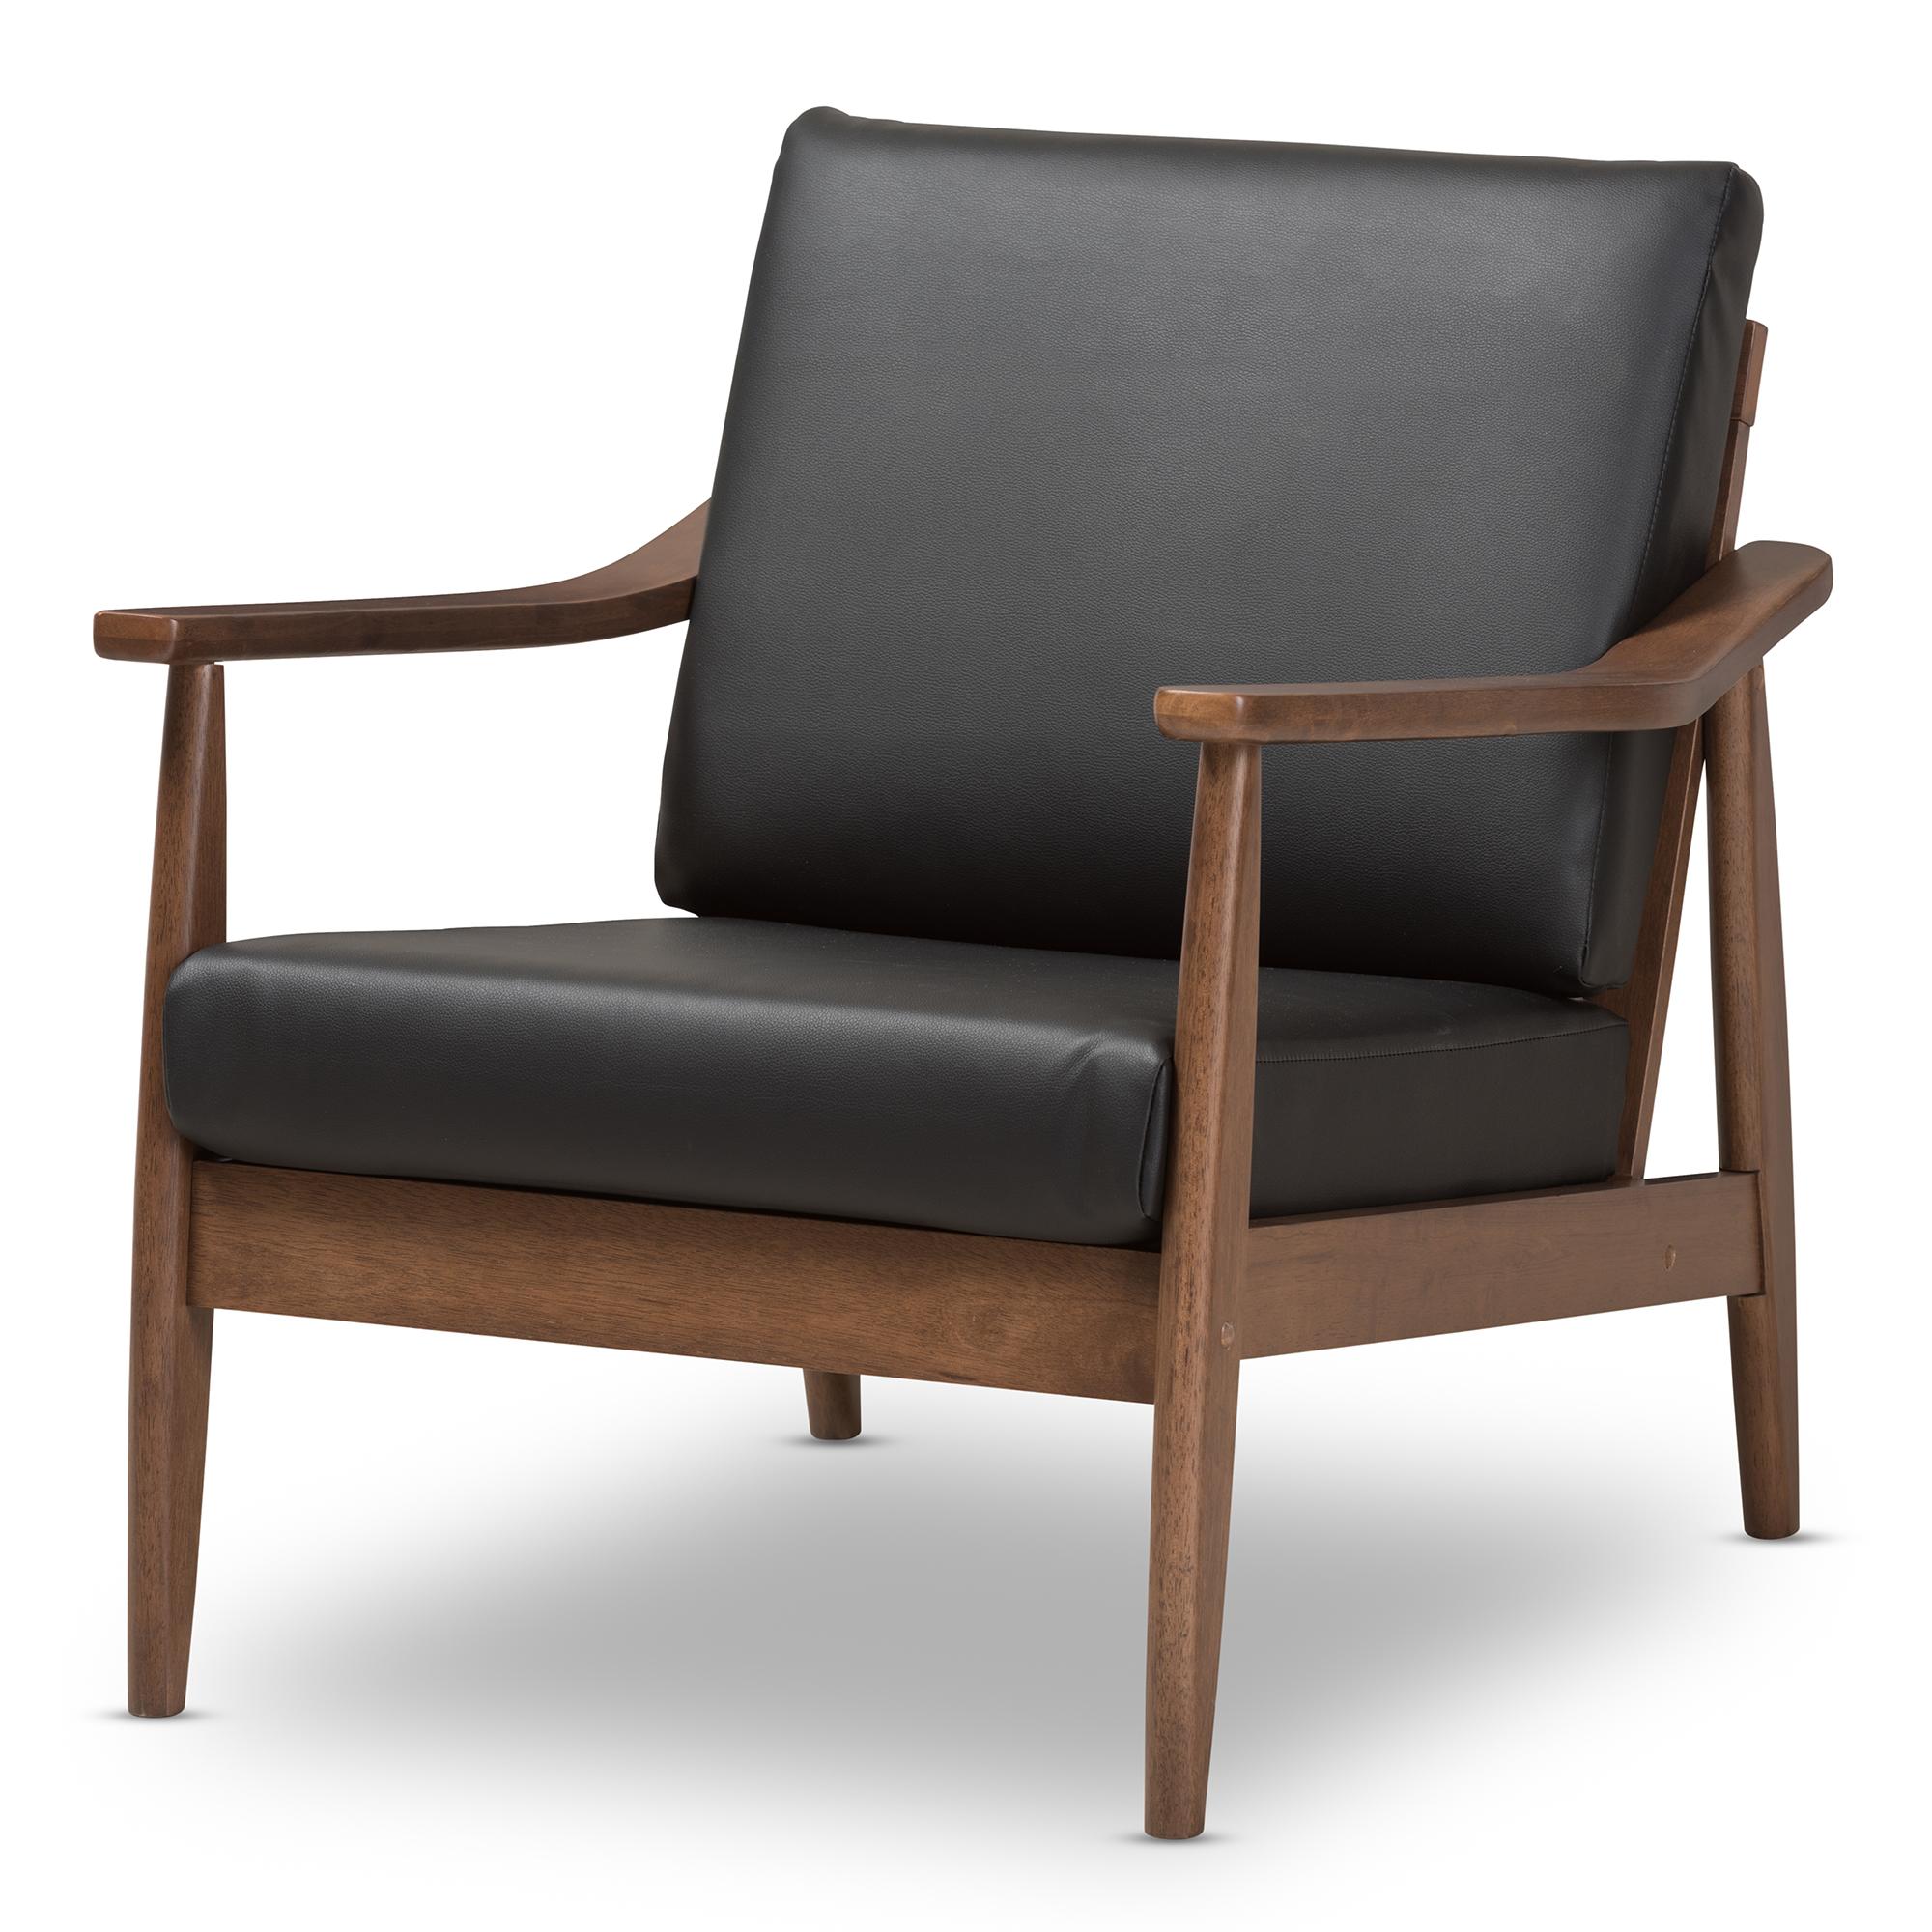 Baxton Studio Venza Mid Century Modern Walnut Wood Black Faux Leather  Lounge Chair